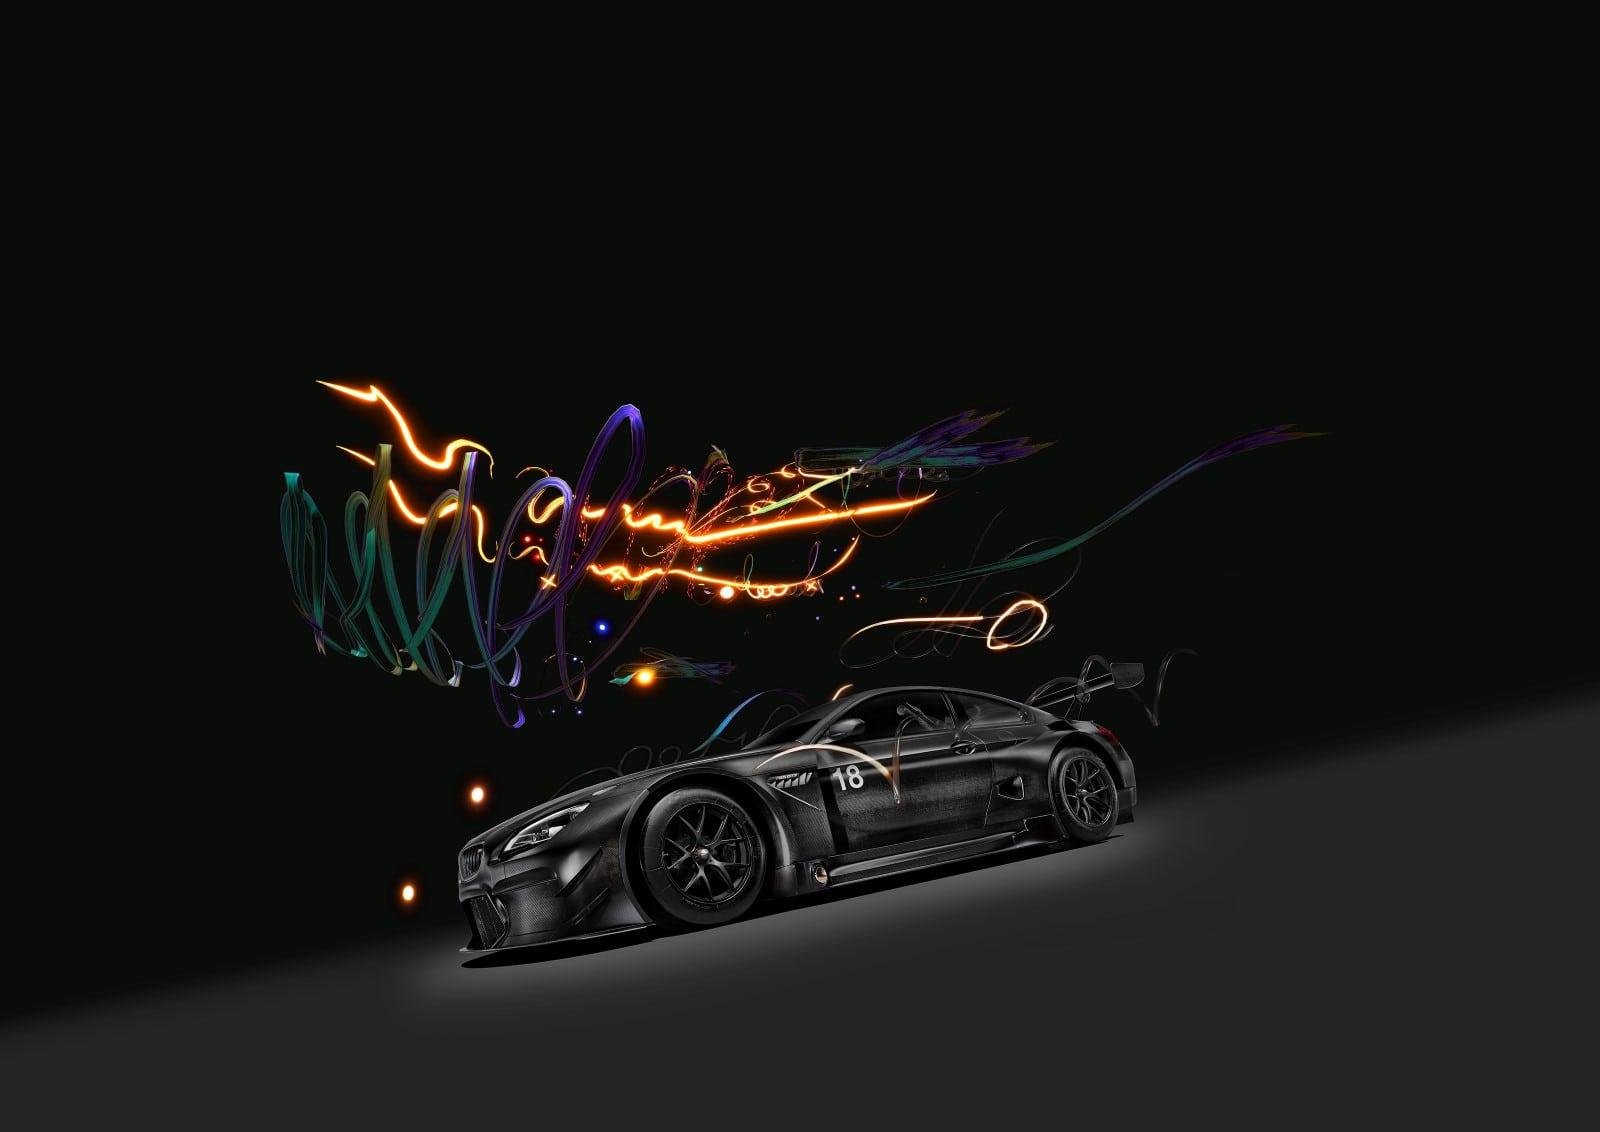 BMW M6 GT3 Art Car by Cao Fei